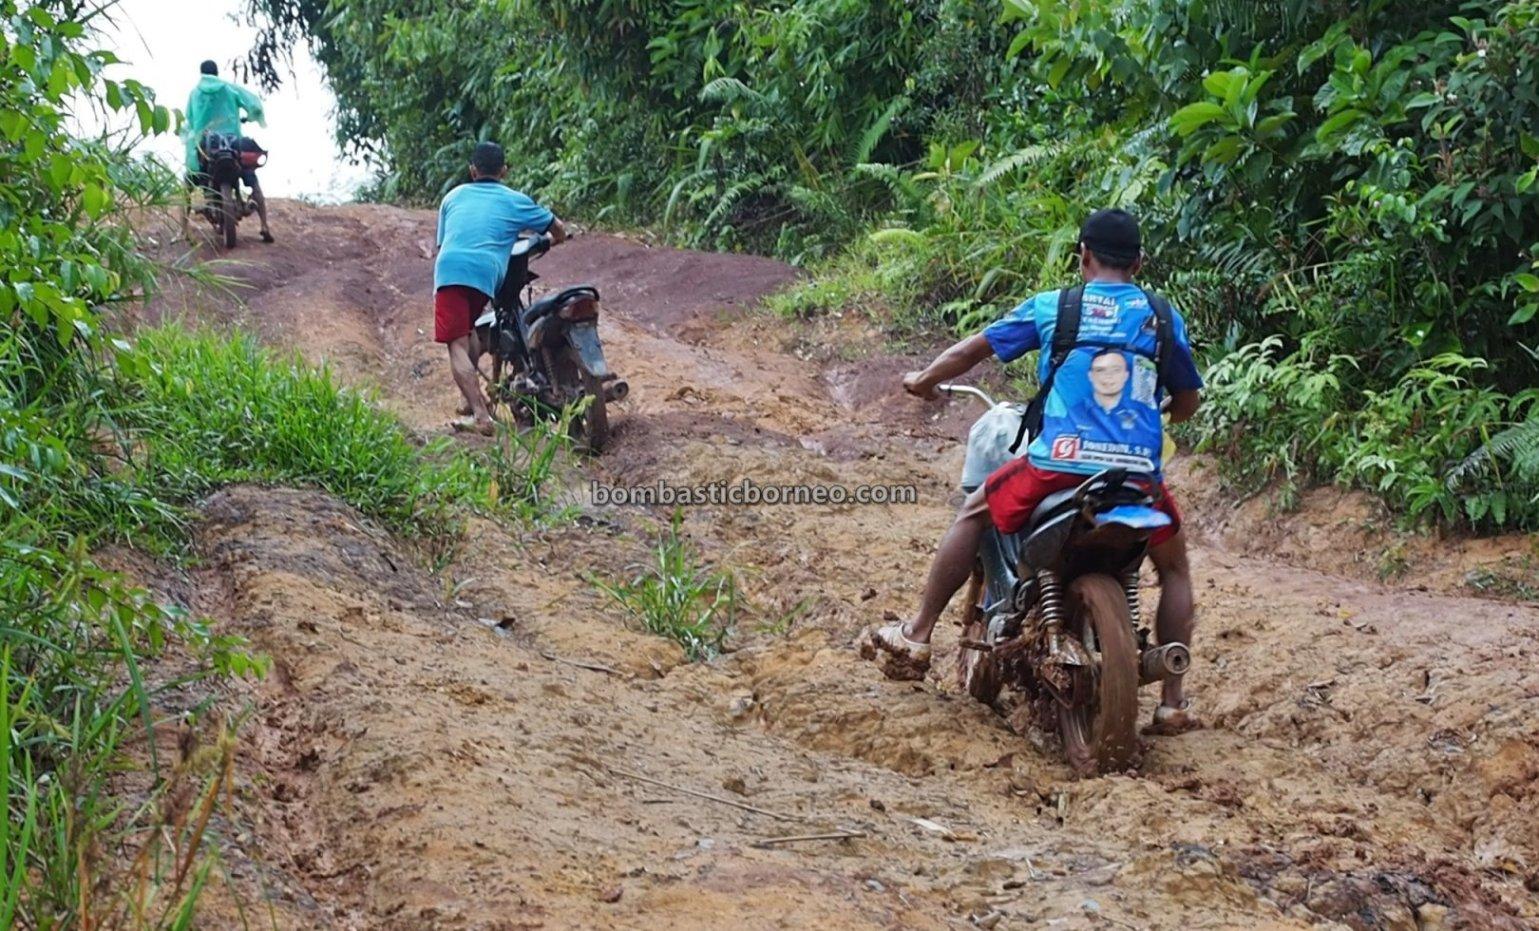 Dusun Kambih, backpackers, event, Bike ride, Desa Bengkawan, Seluas, Dayak Kowon't, native, obyek wisata, Tourism, Travel guide, village, 探索婆罗洲游踪, 印尼西加里曼丹, 孟加映土著部落